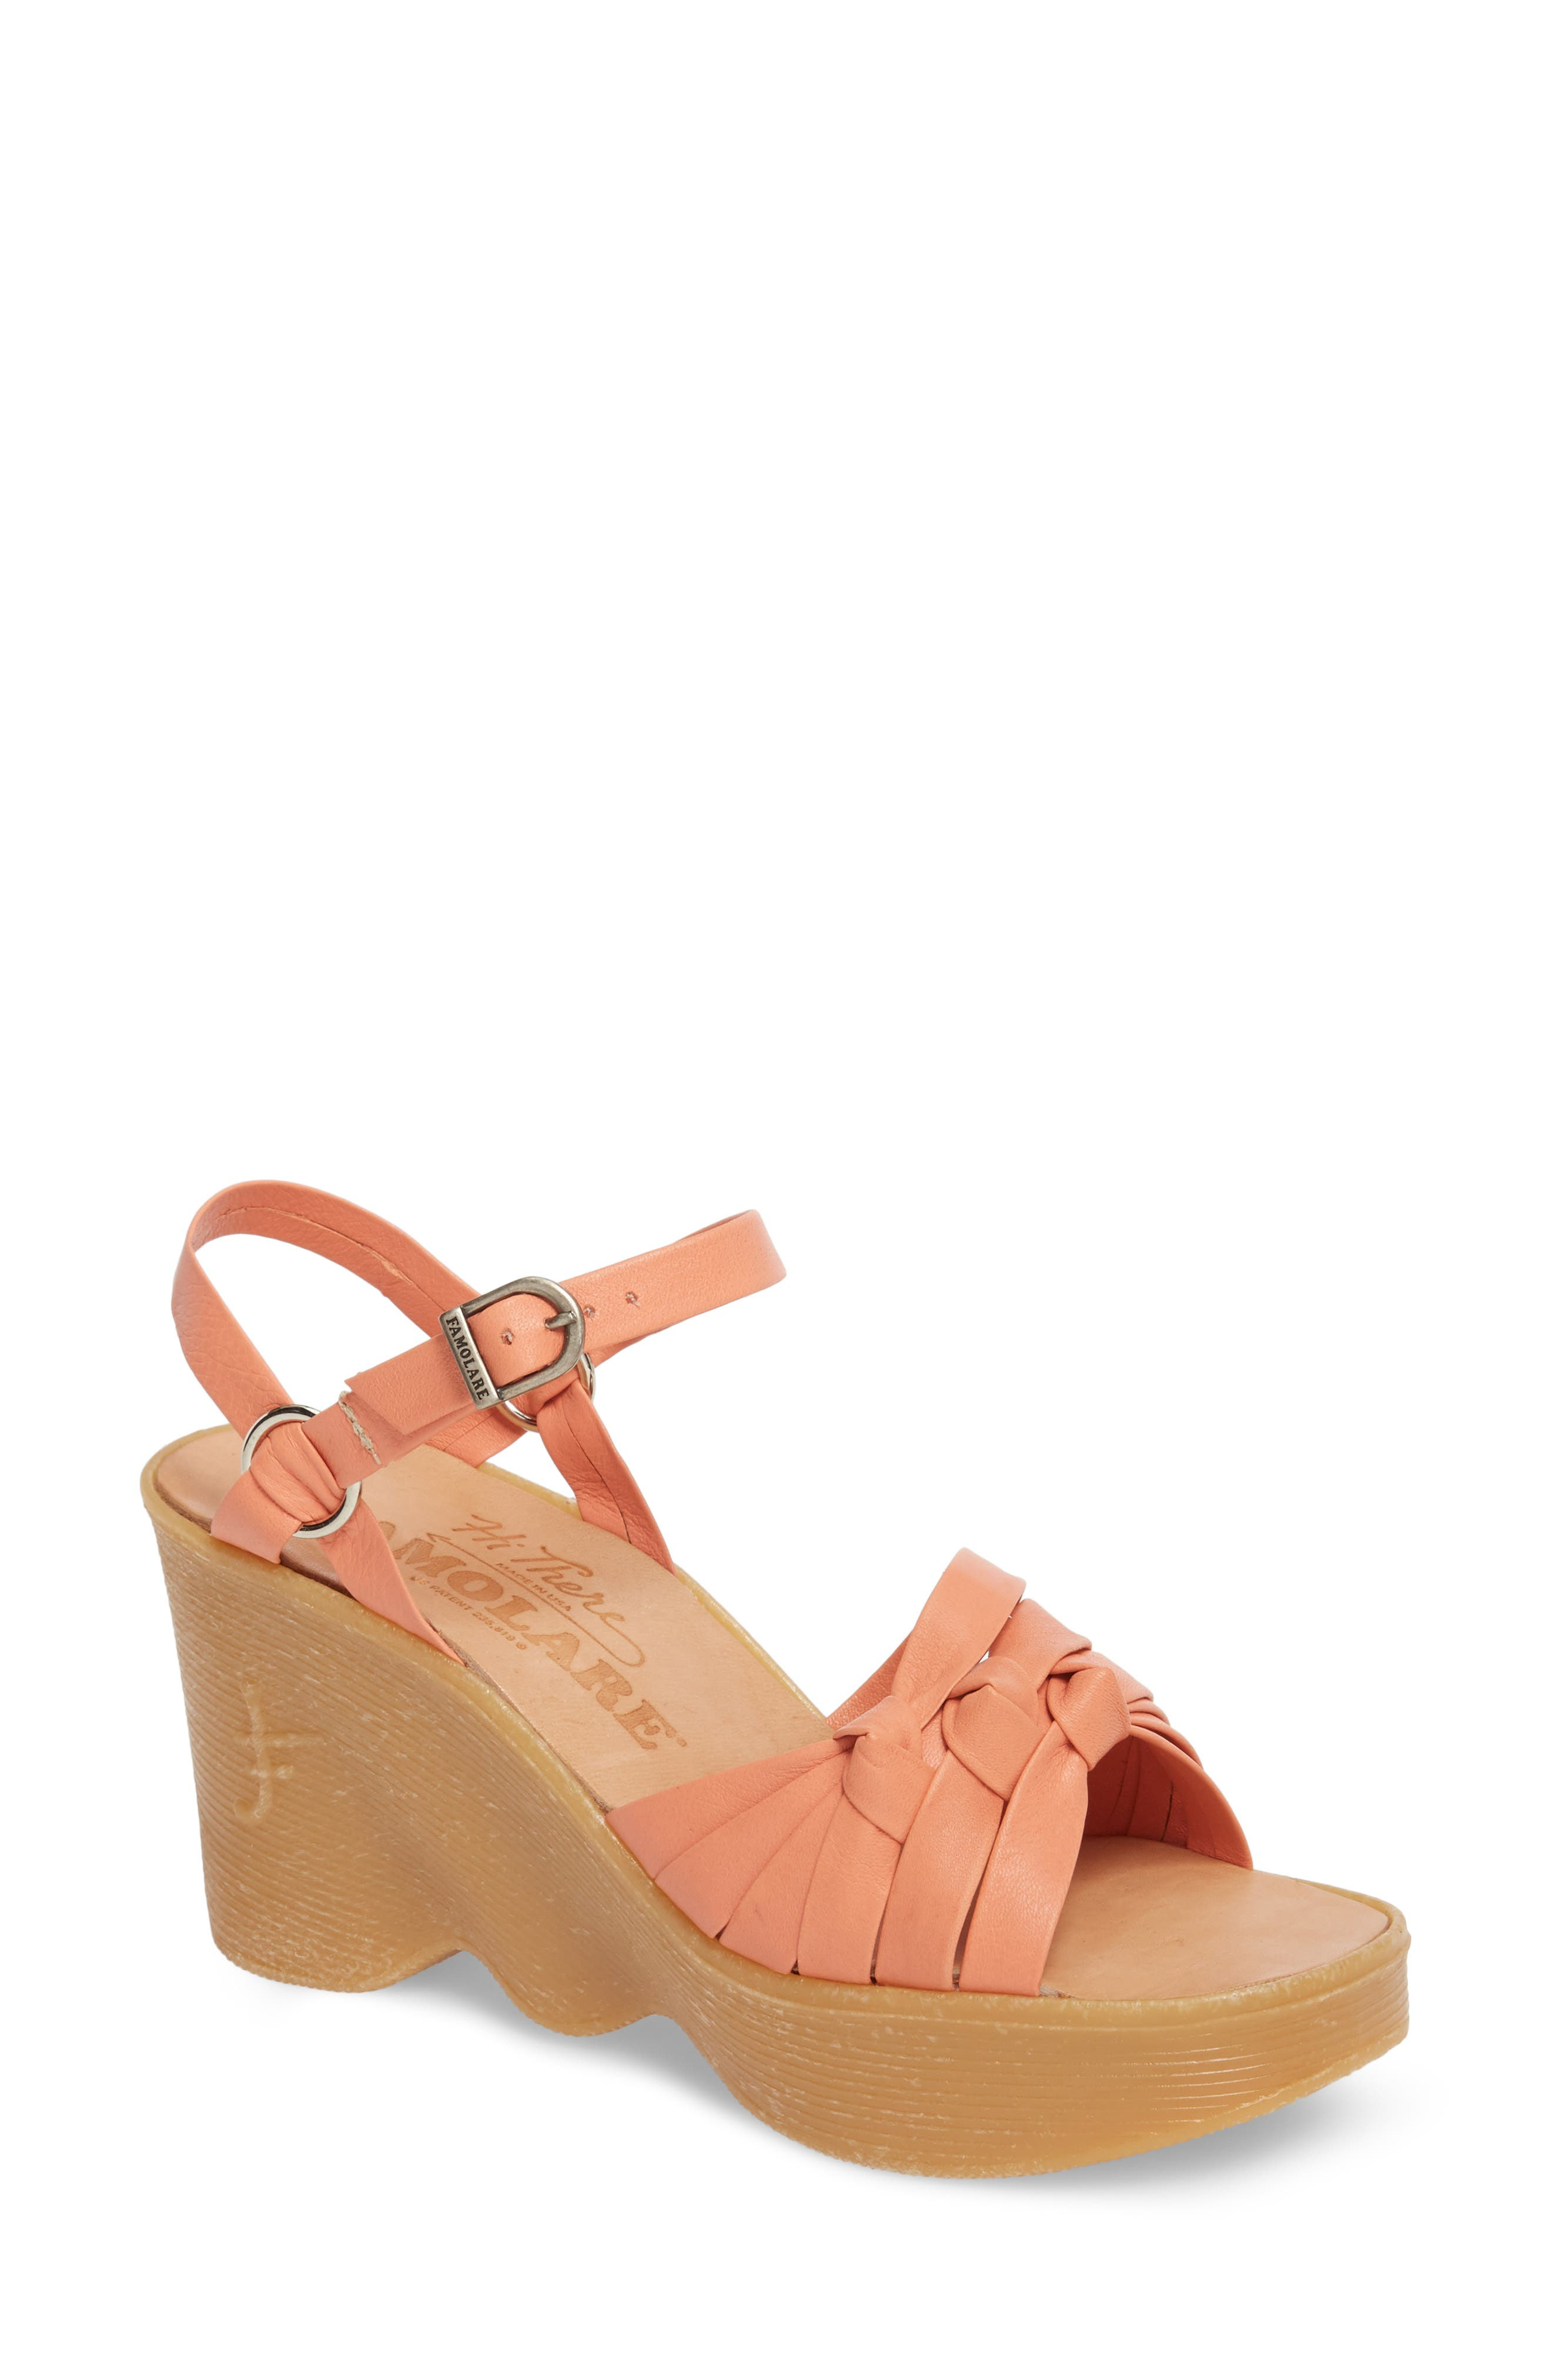 Alternate Image 1 Selected - Famolare Knot So Fast Wedge Sandal (Women)